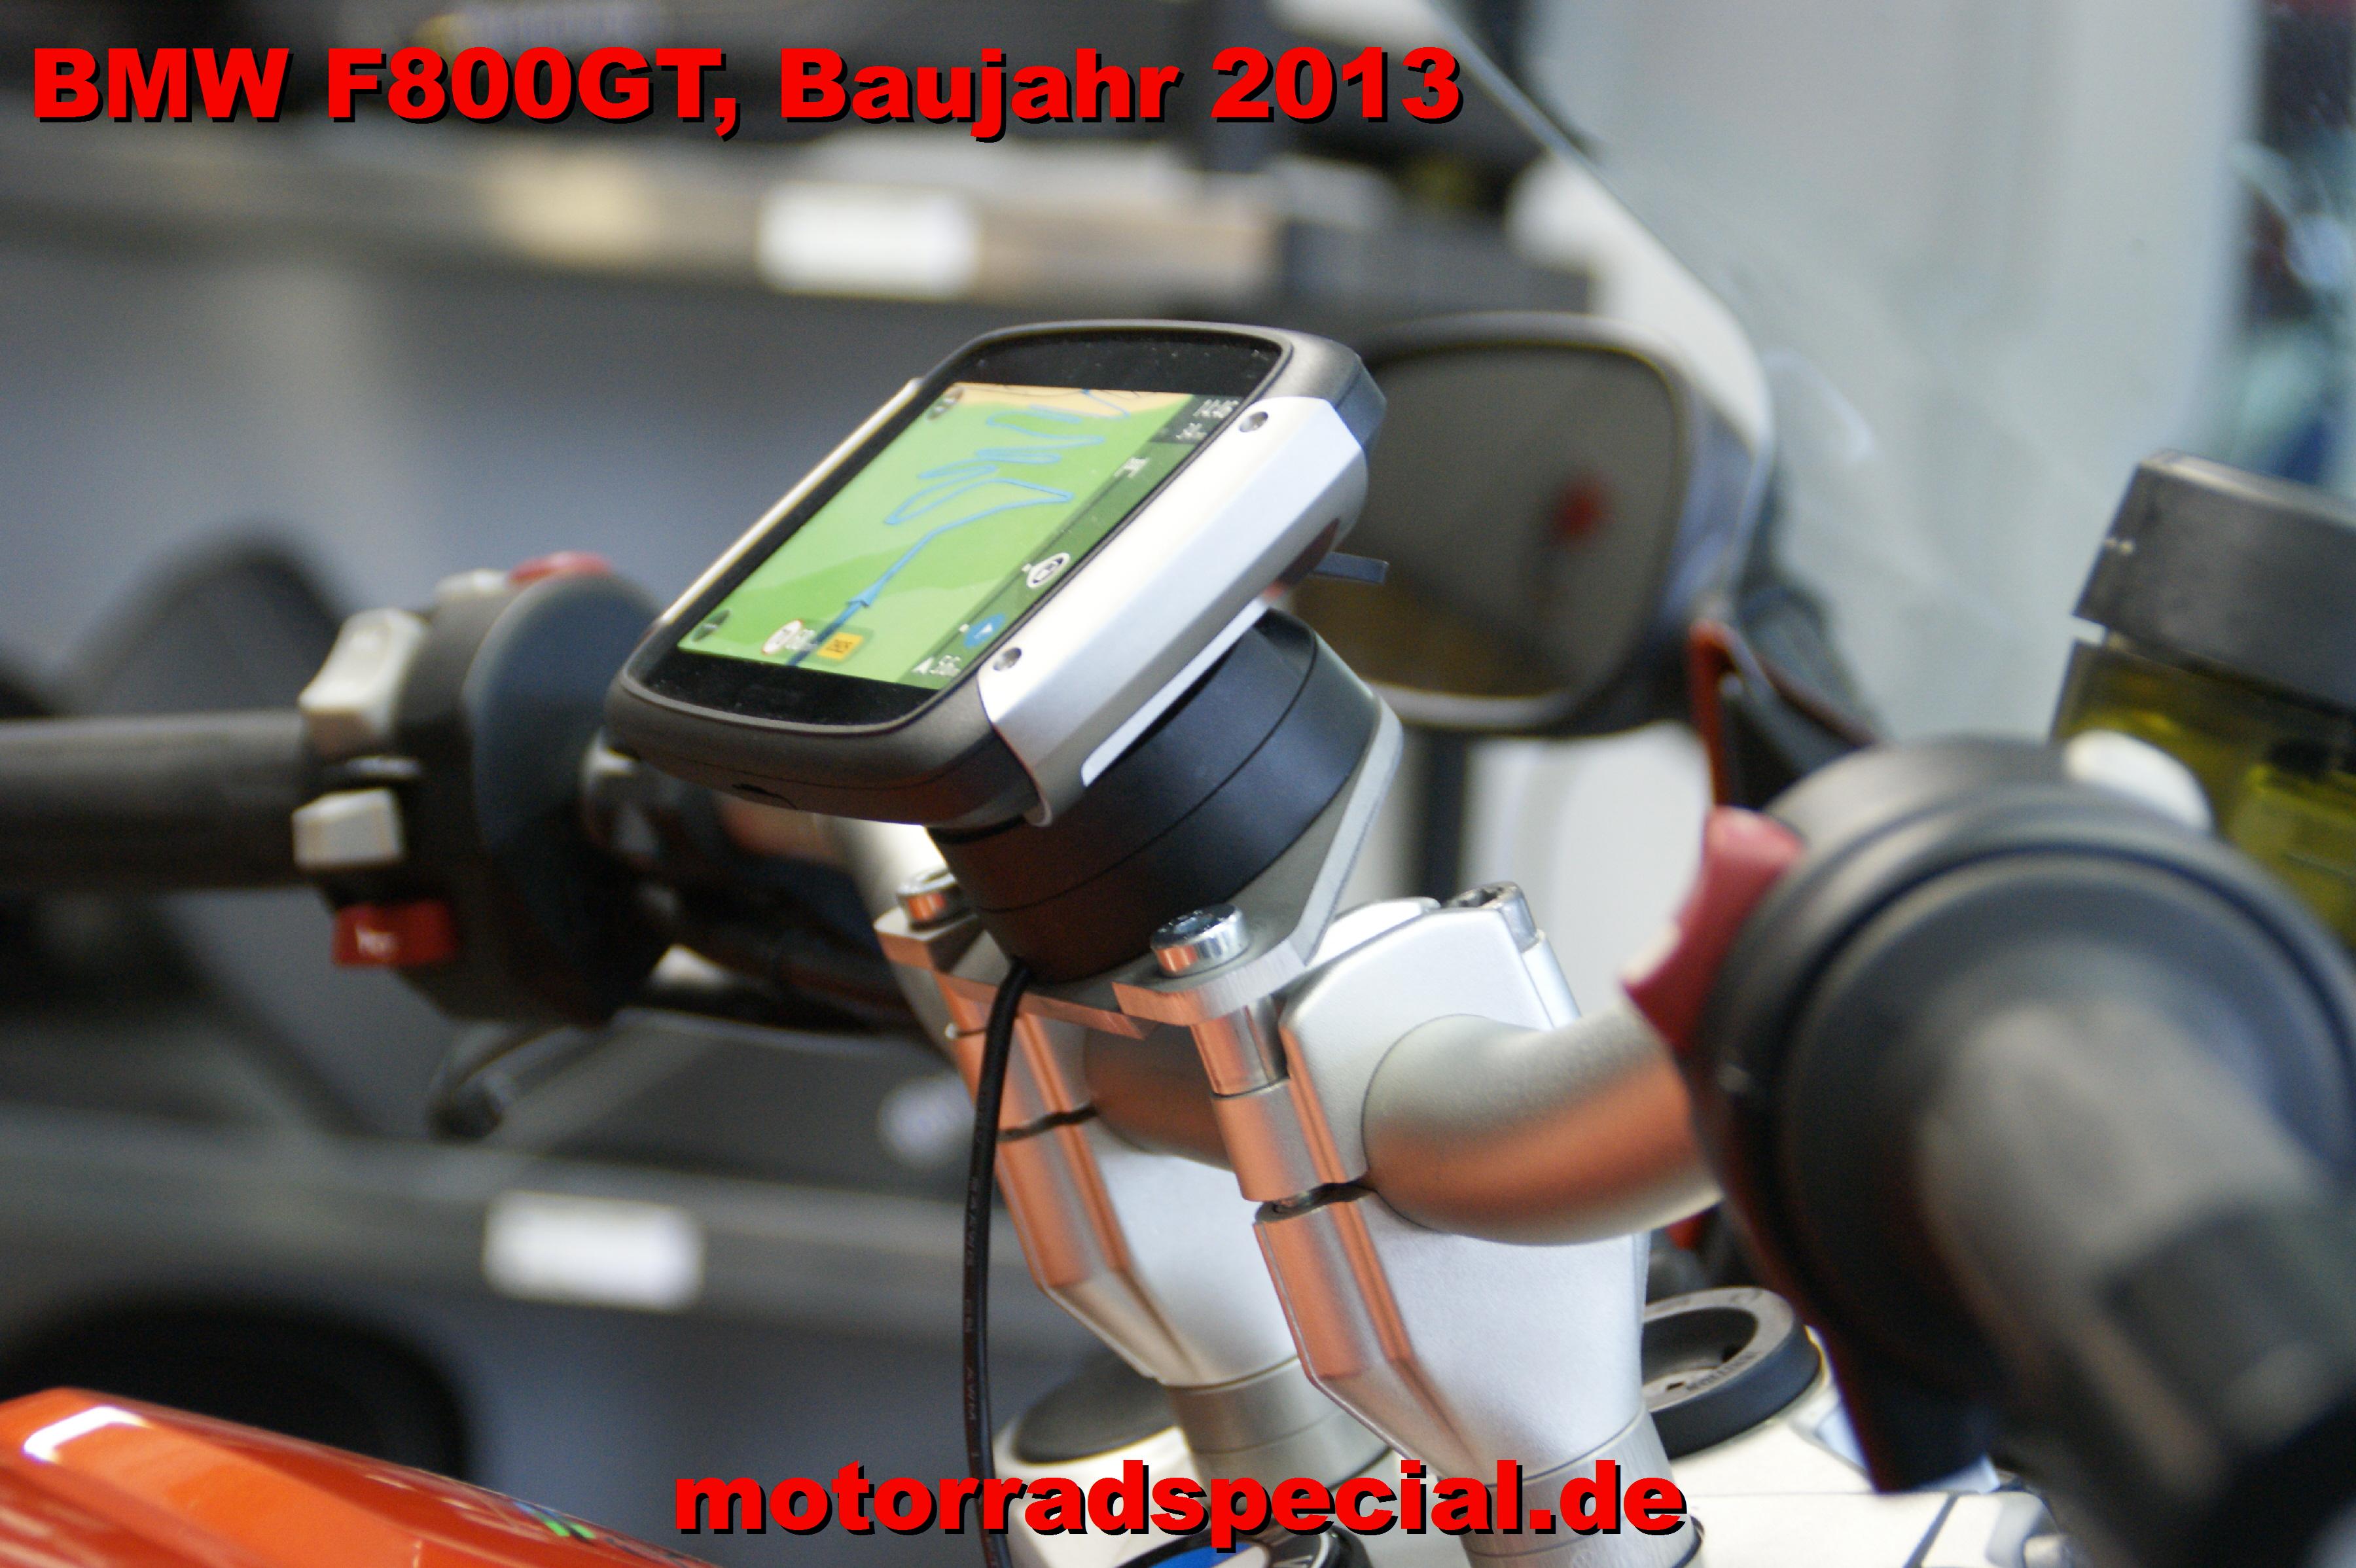 BMW_F800GT_Bauahr2013_Navigationshalterung_Navihalter_Navihalterung_3